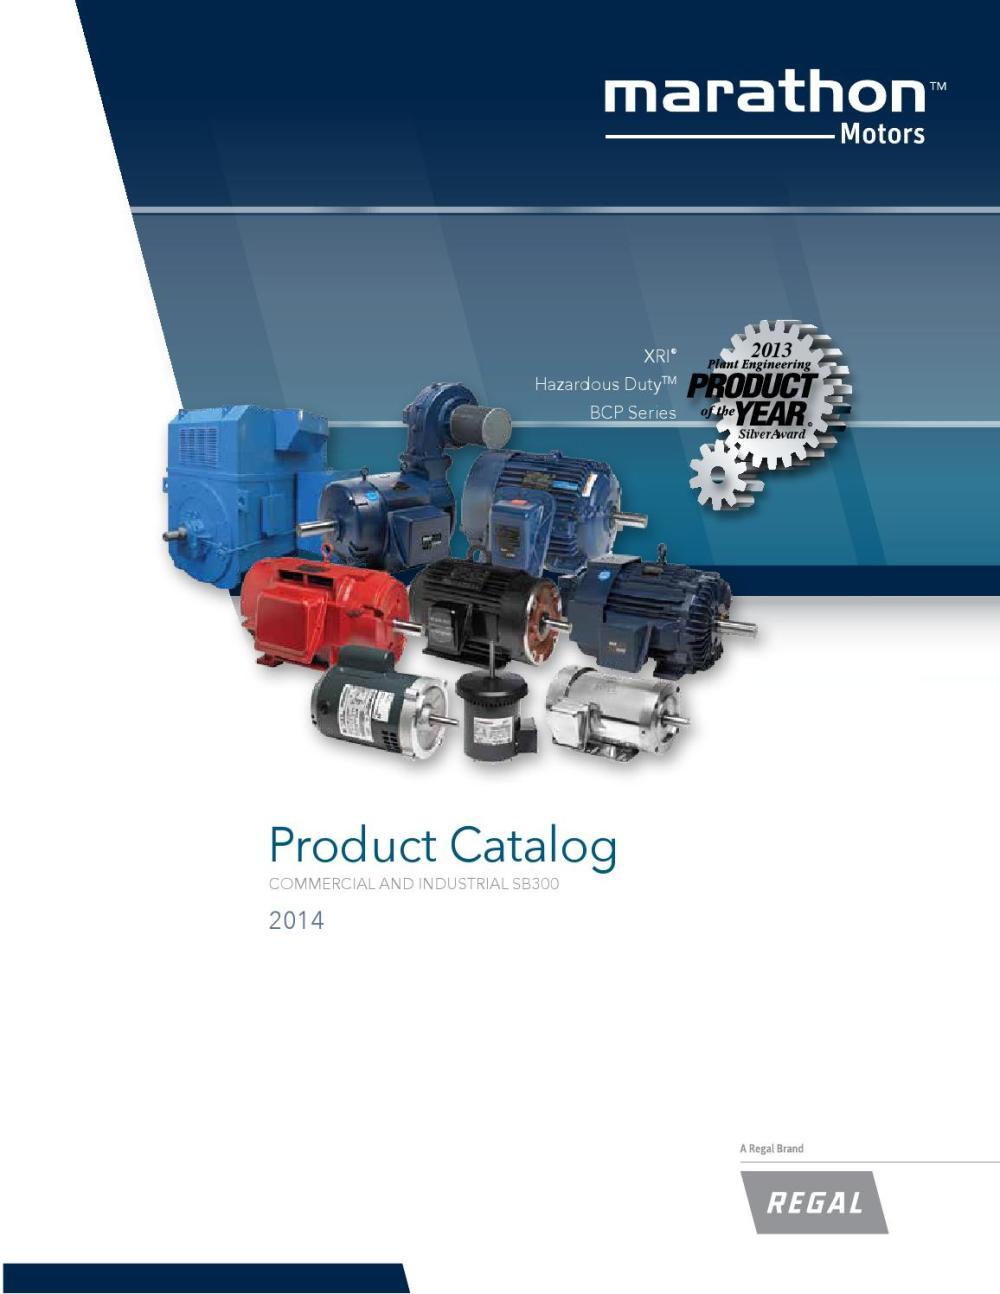 medium resolution of marathon motors general catalog